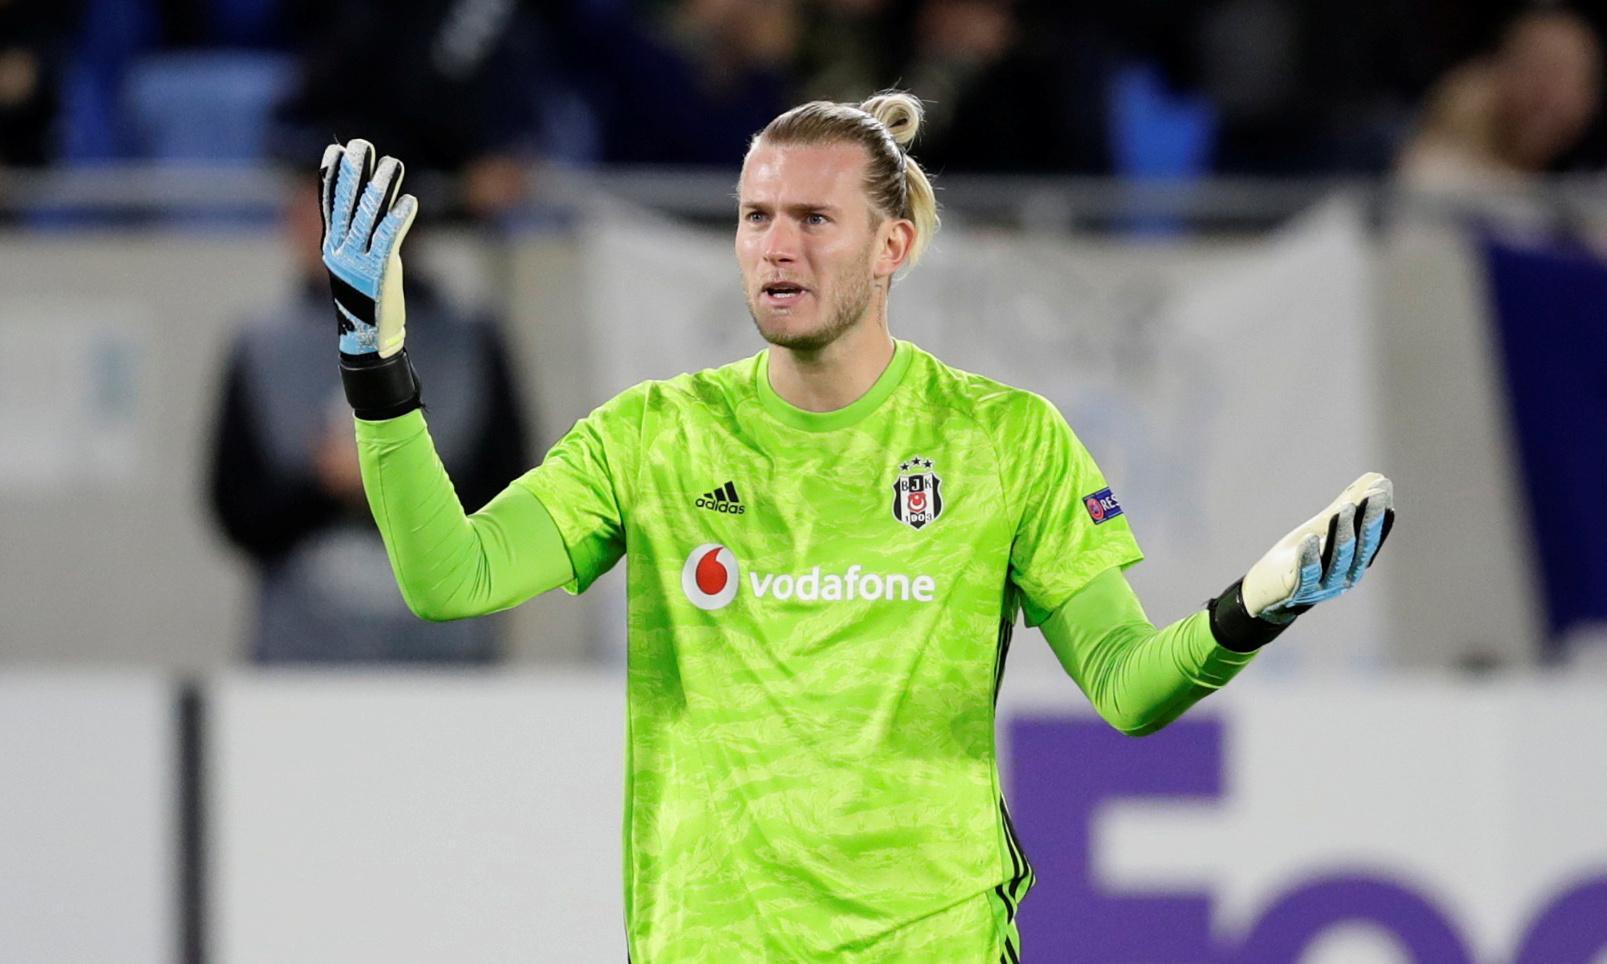 Europa League: Karius drops clanger in Besiktas defeat, Dudelange shock Apoel